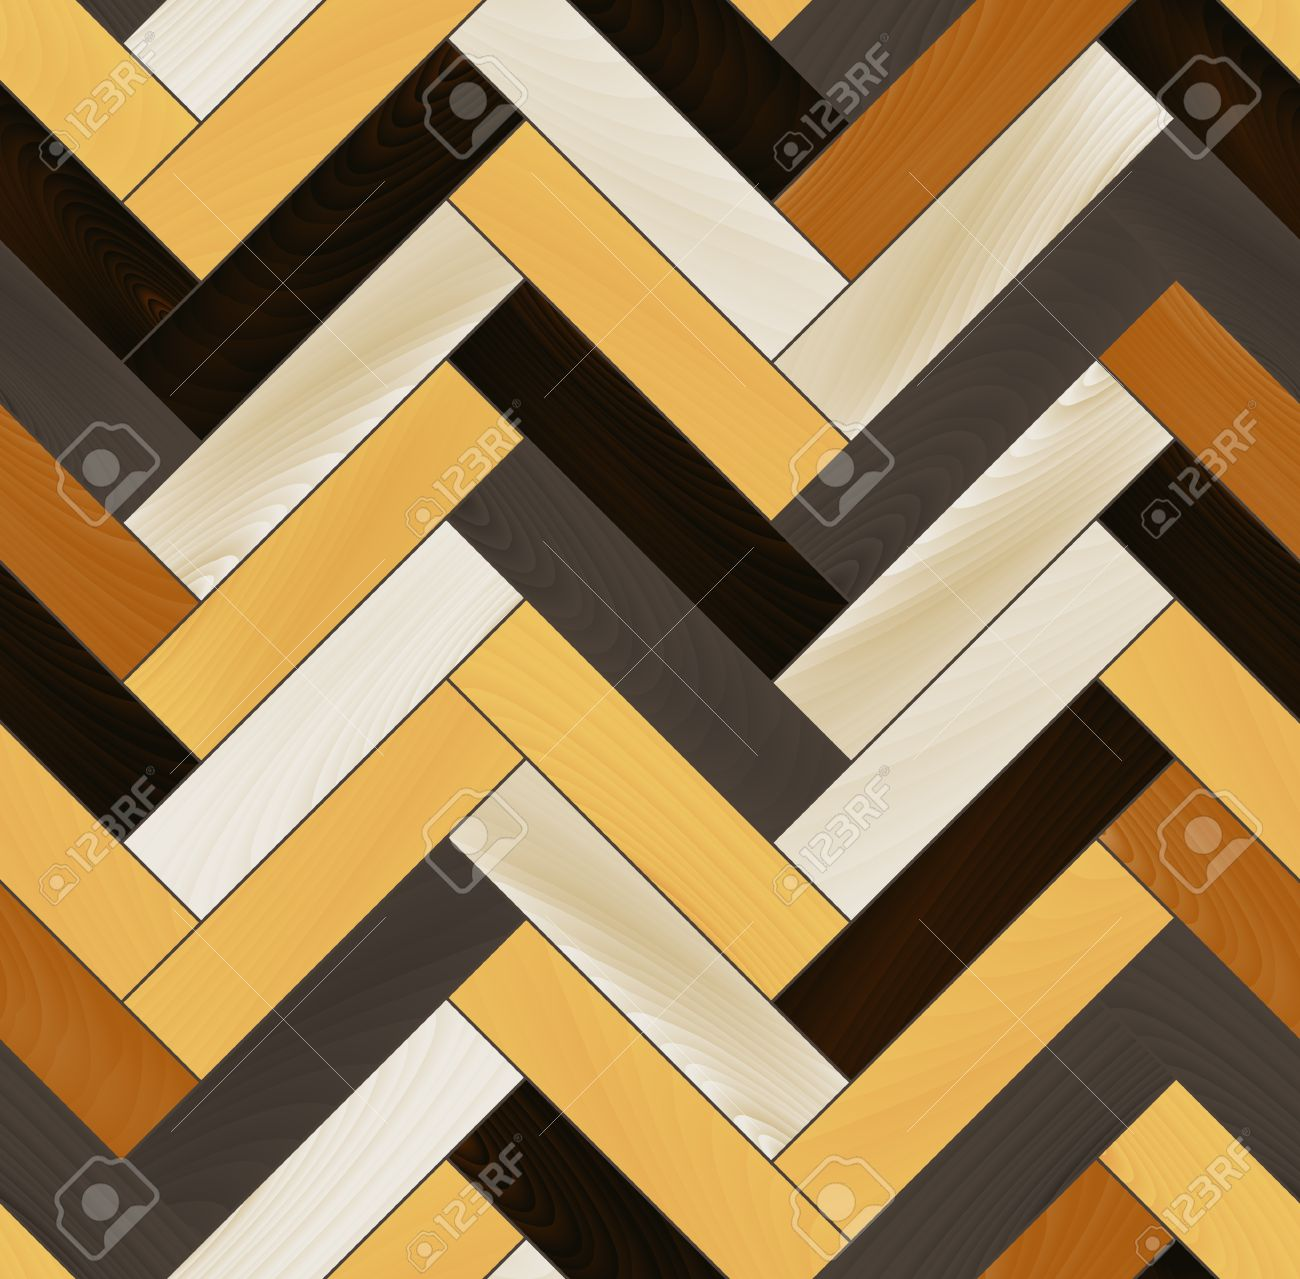 Colorful realistic wooden floor herringbone parquet seamless pattern - 26043562